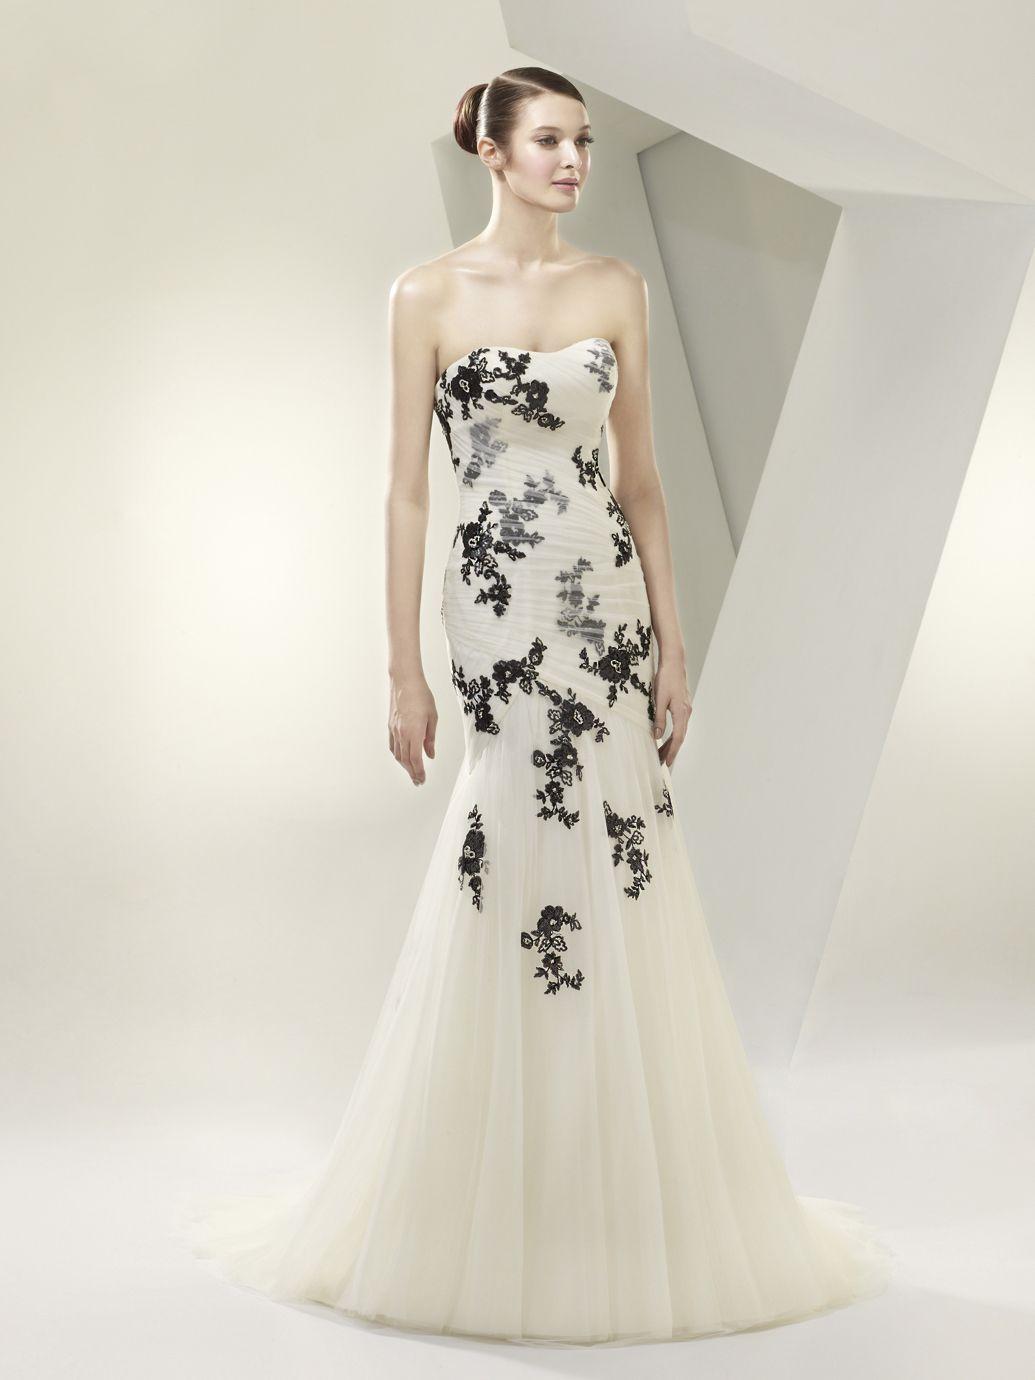 Black white wedding dress  Beautiful BT front View  RBW  BlackWhiteRed Handfasting